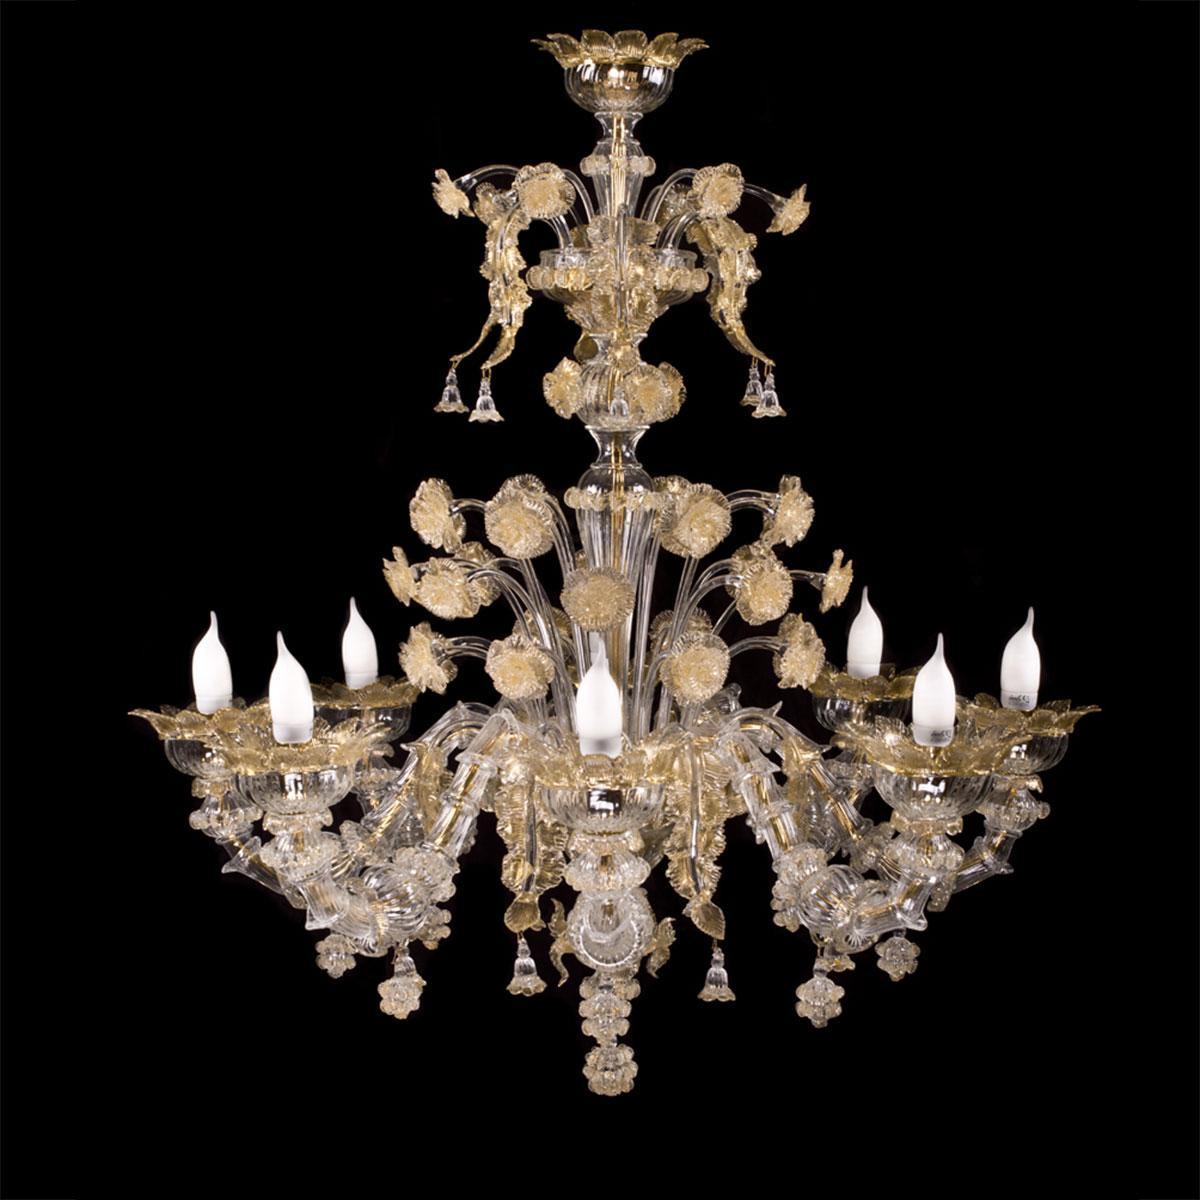 """Maria"" lustre en cristal de Murano - 8 lumières"